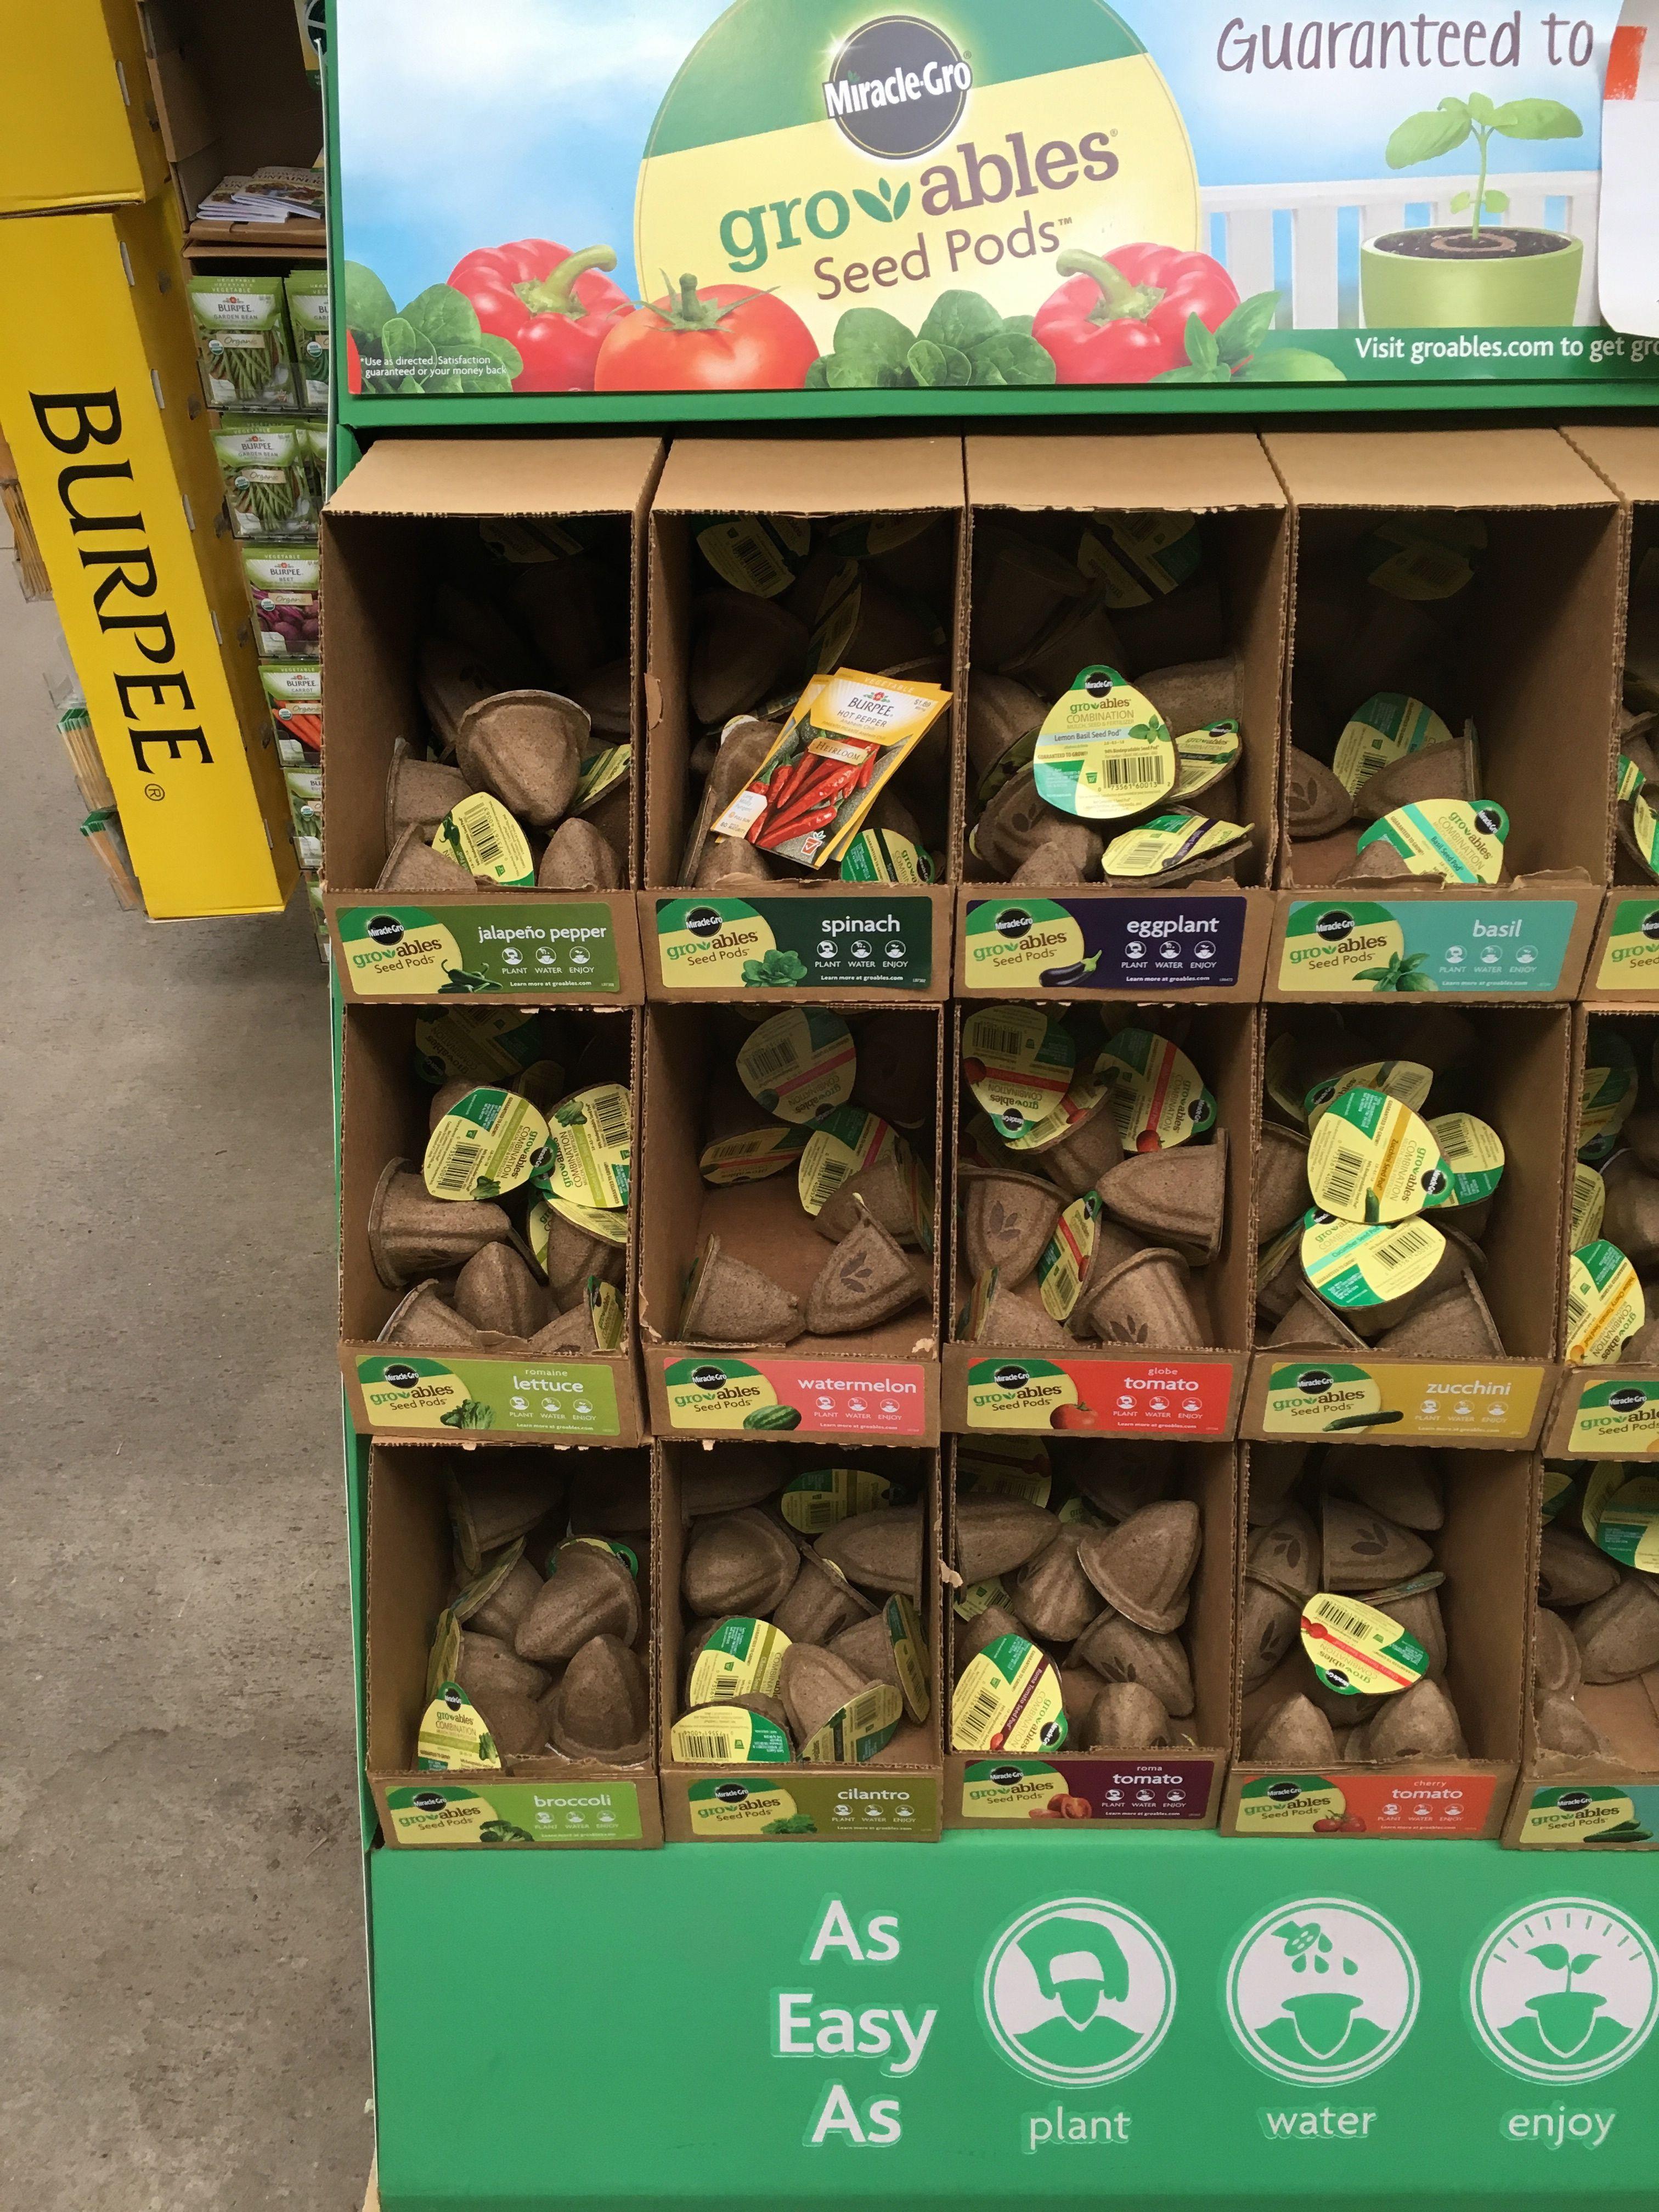 Home Depot display